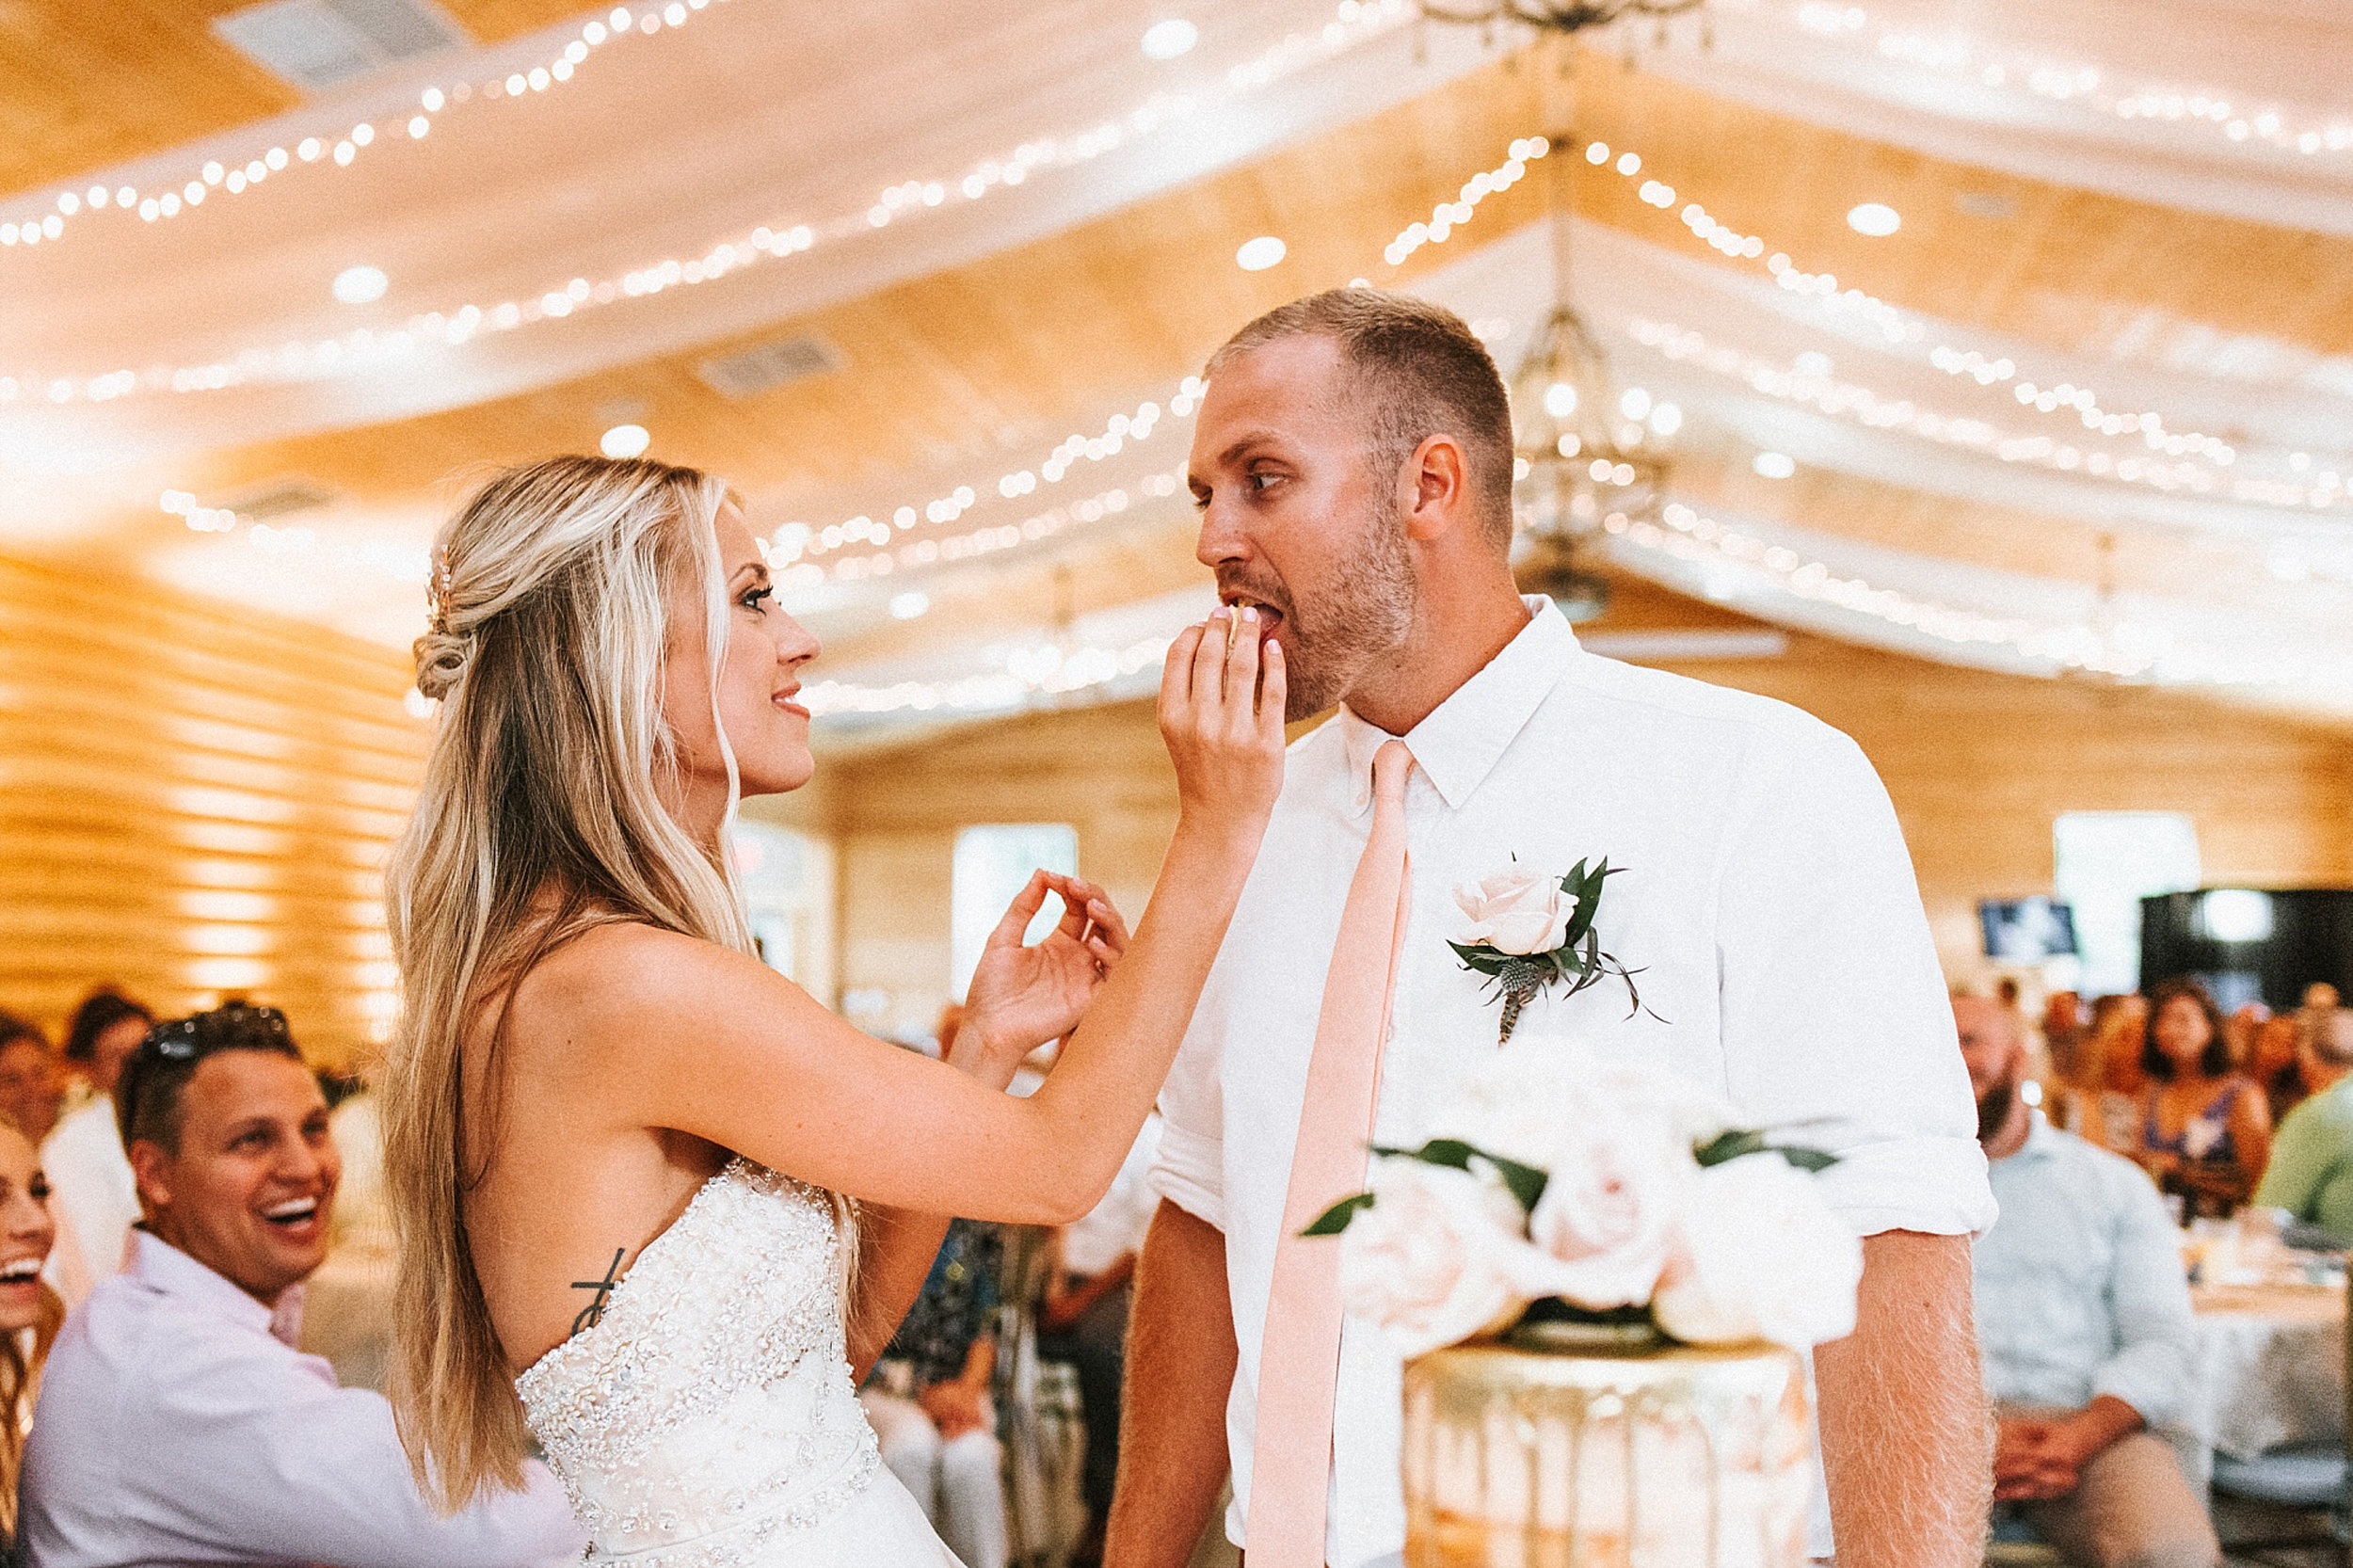 Brooke Townsend Photography - Cincinnati Wedding Photographer (141 of 153).jpg